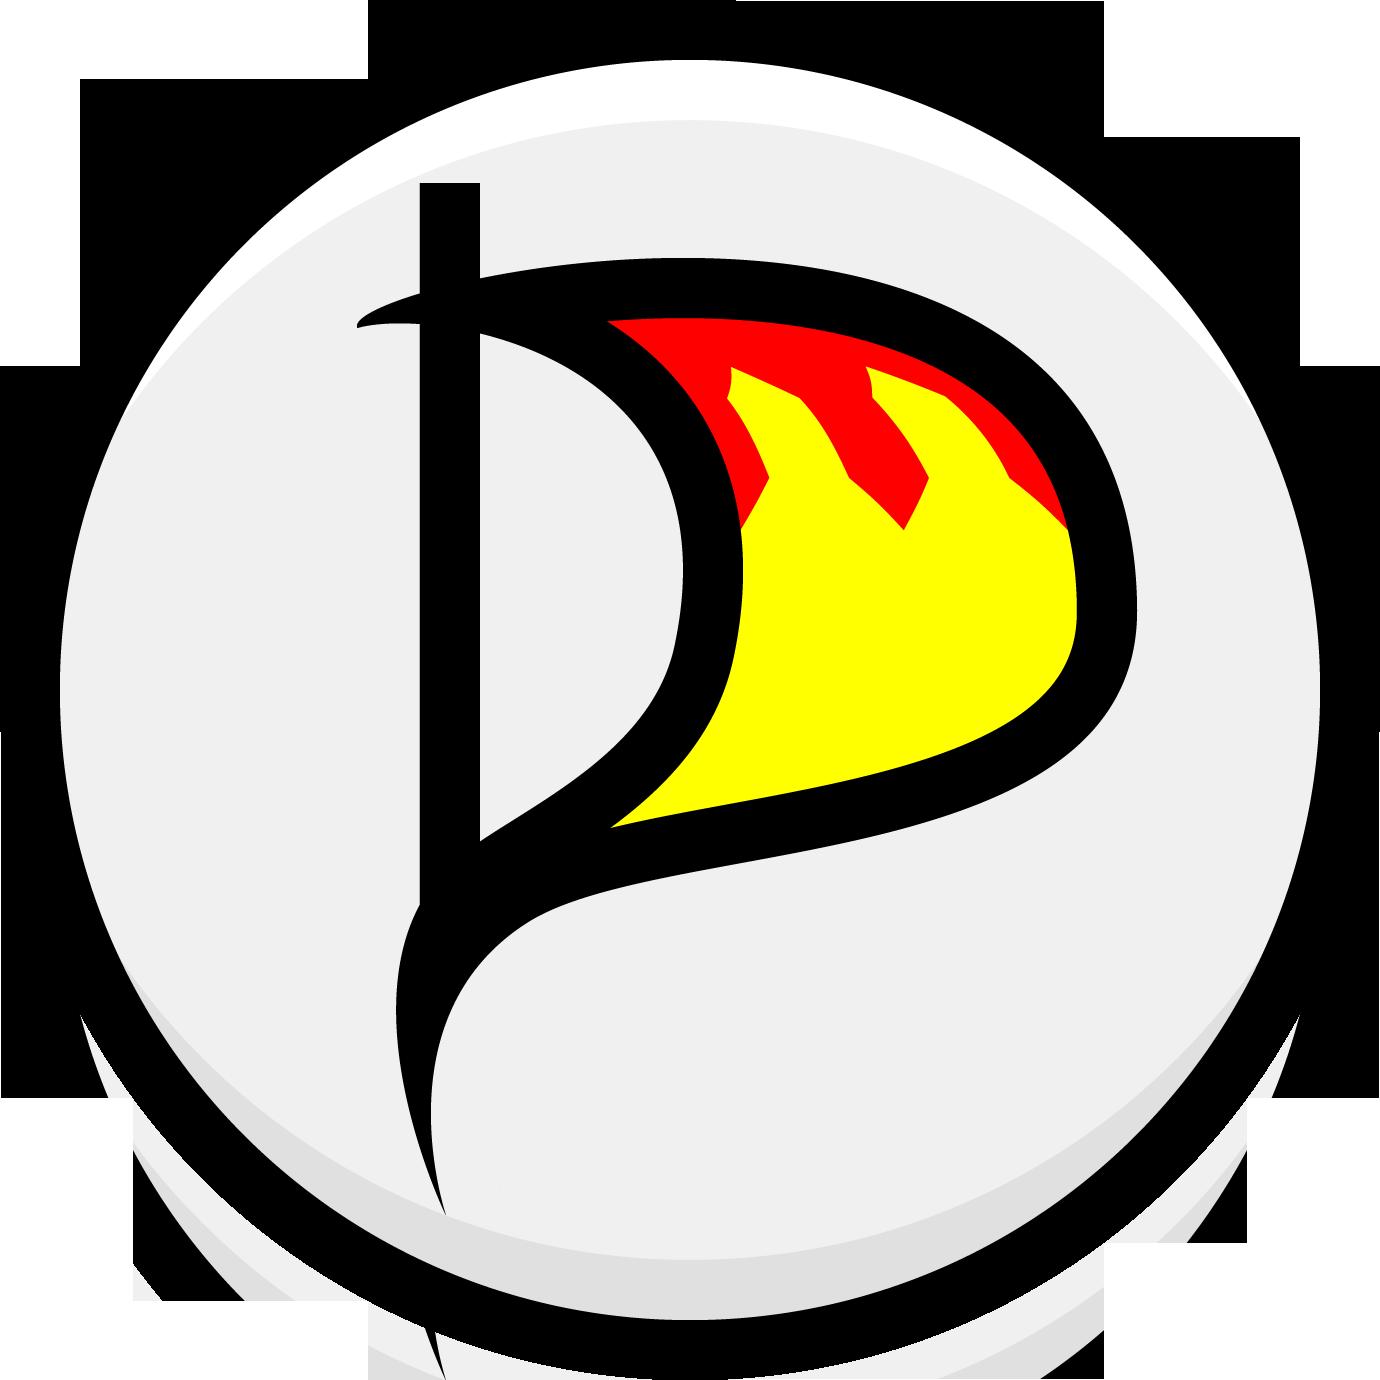 Pirkanmaan-Piraatit-v4